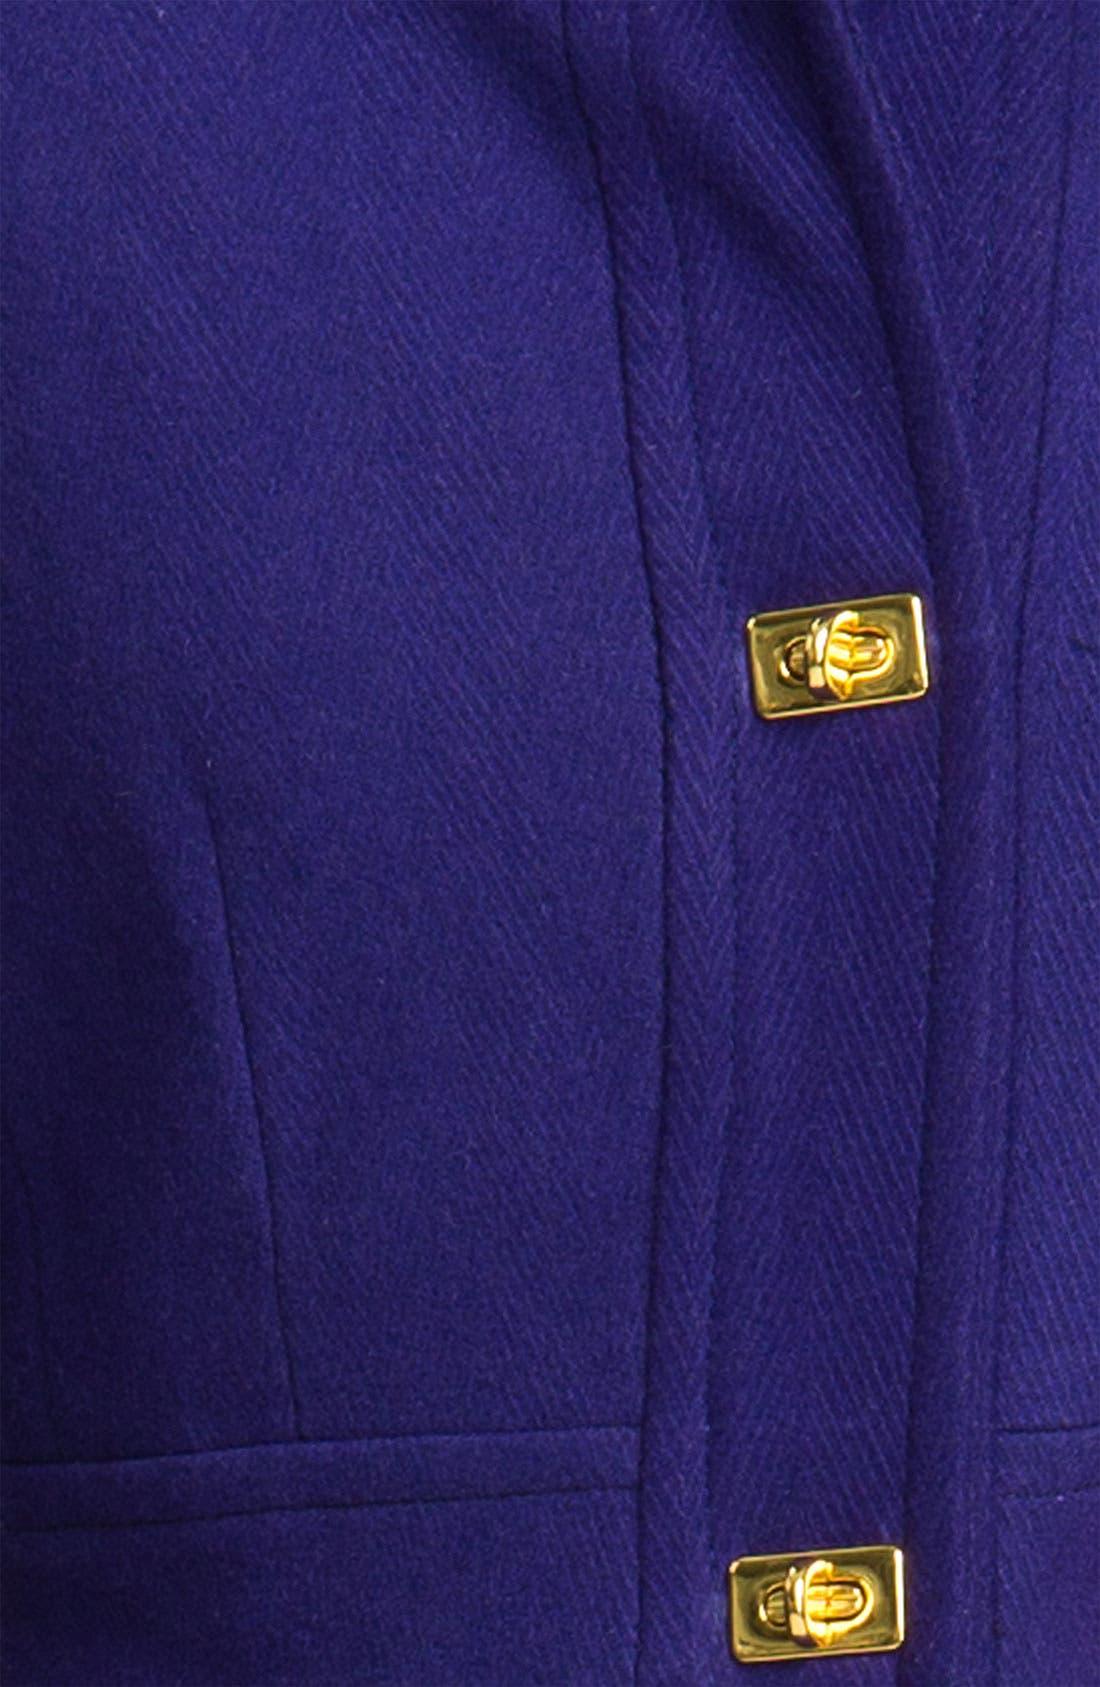 Alternate Image 3  - DKNY 'Kendra' Turnkey Wool Blend Coat (Nordstrom Exclusive)